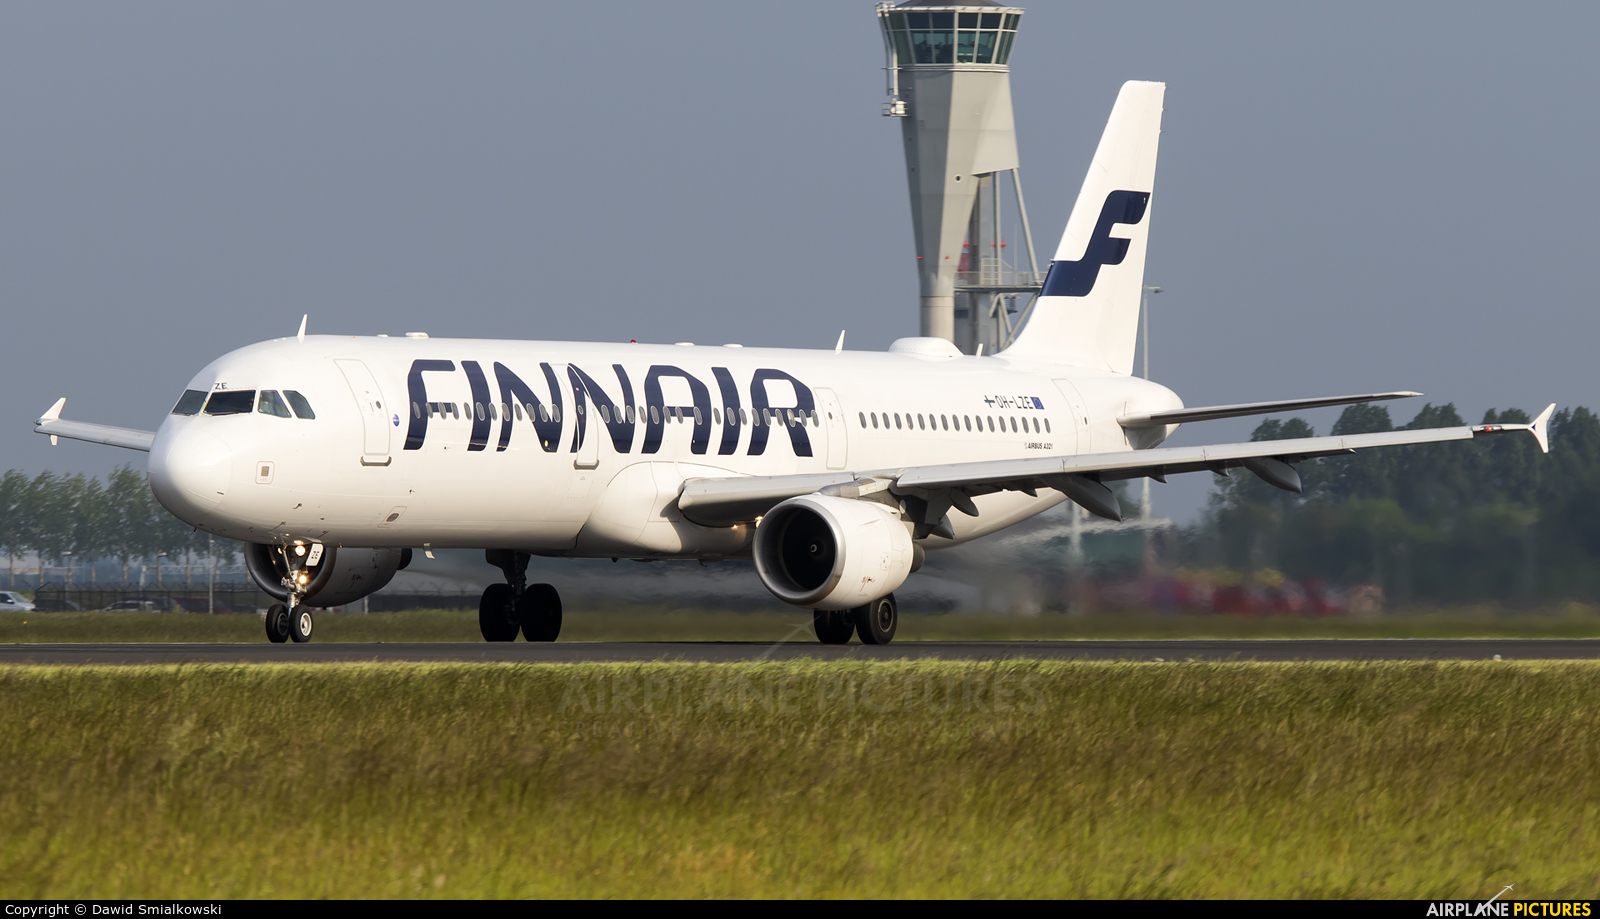 Finnair OH-LZE aircraft at Amsterdam - Schiphol